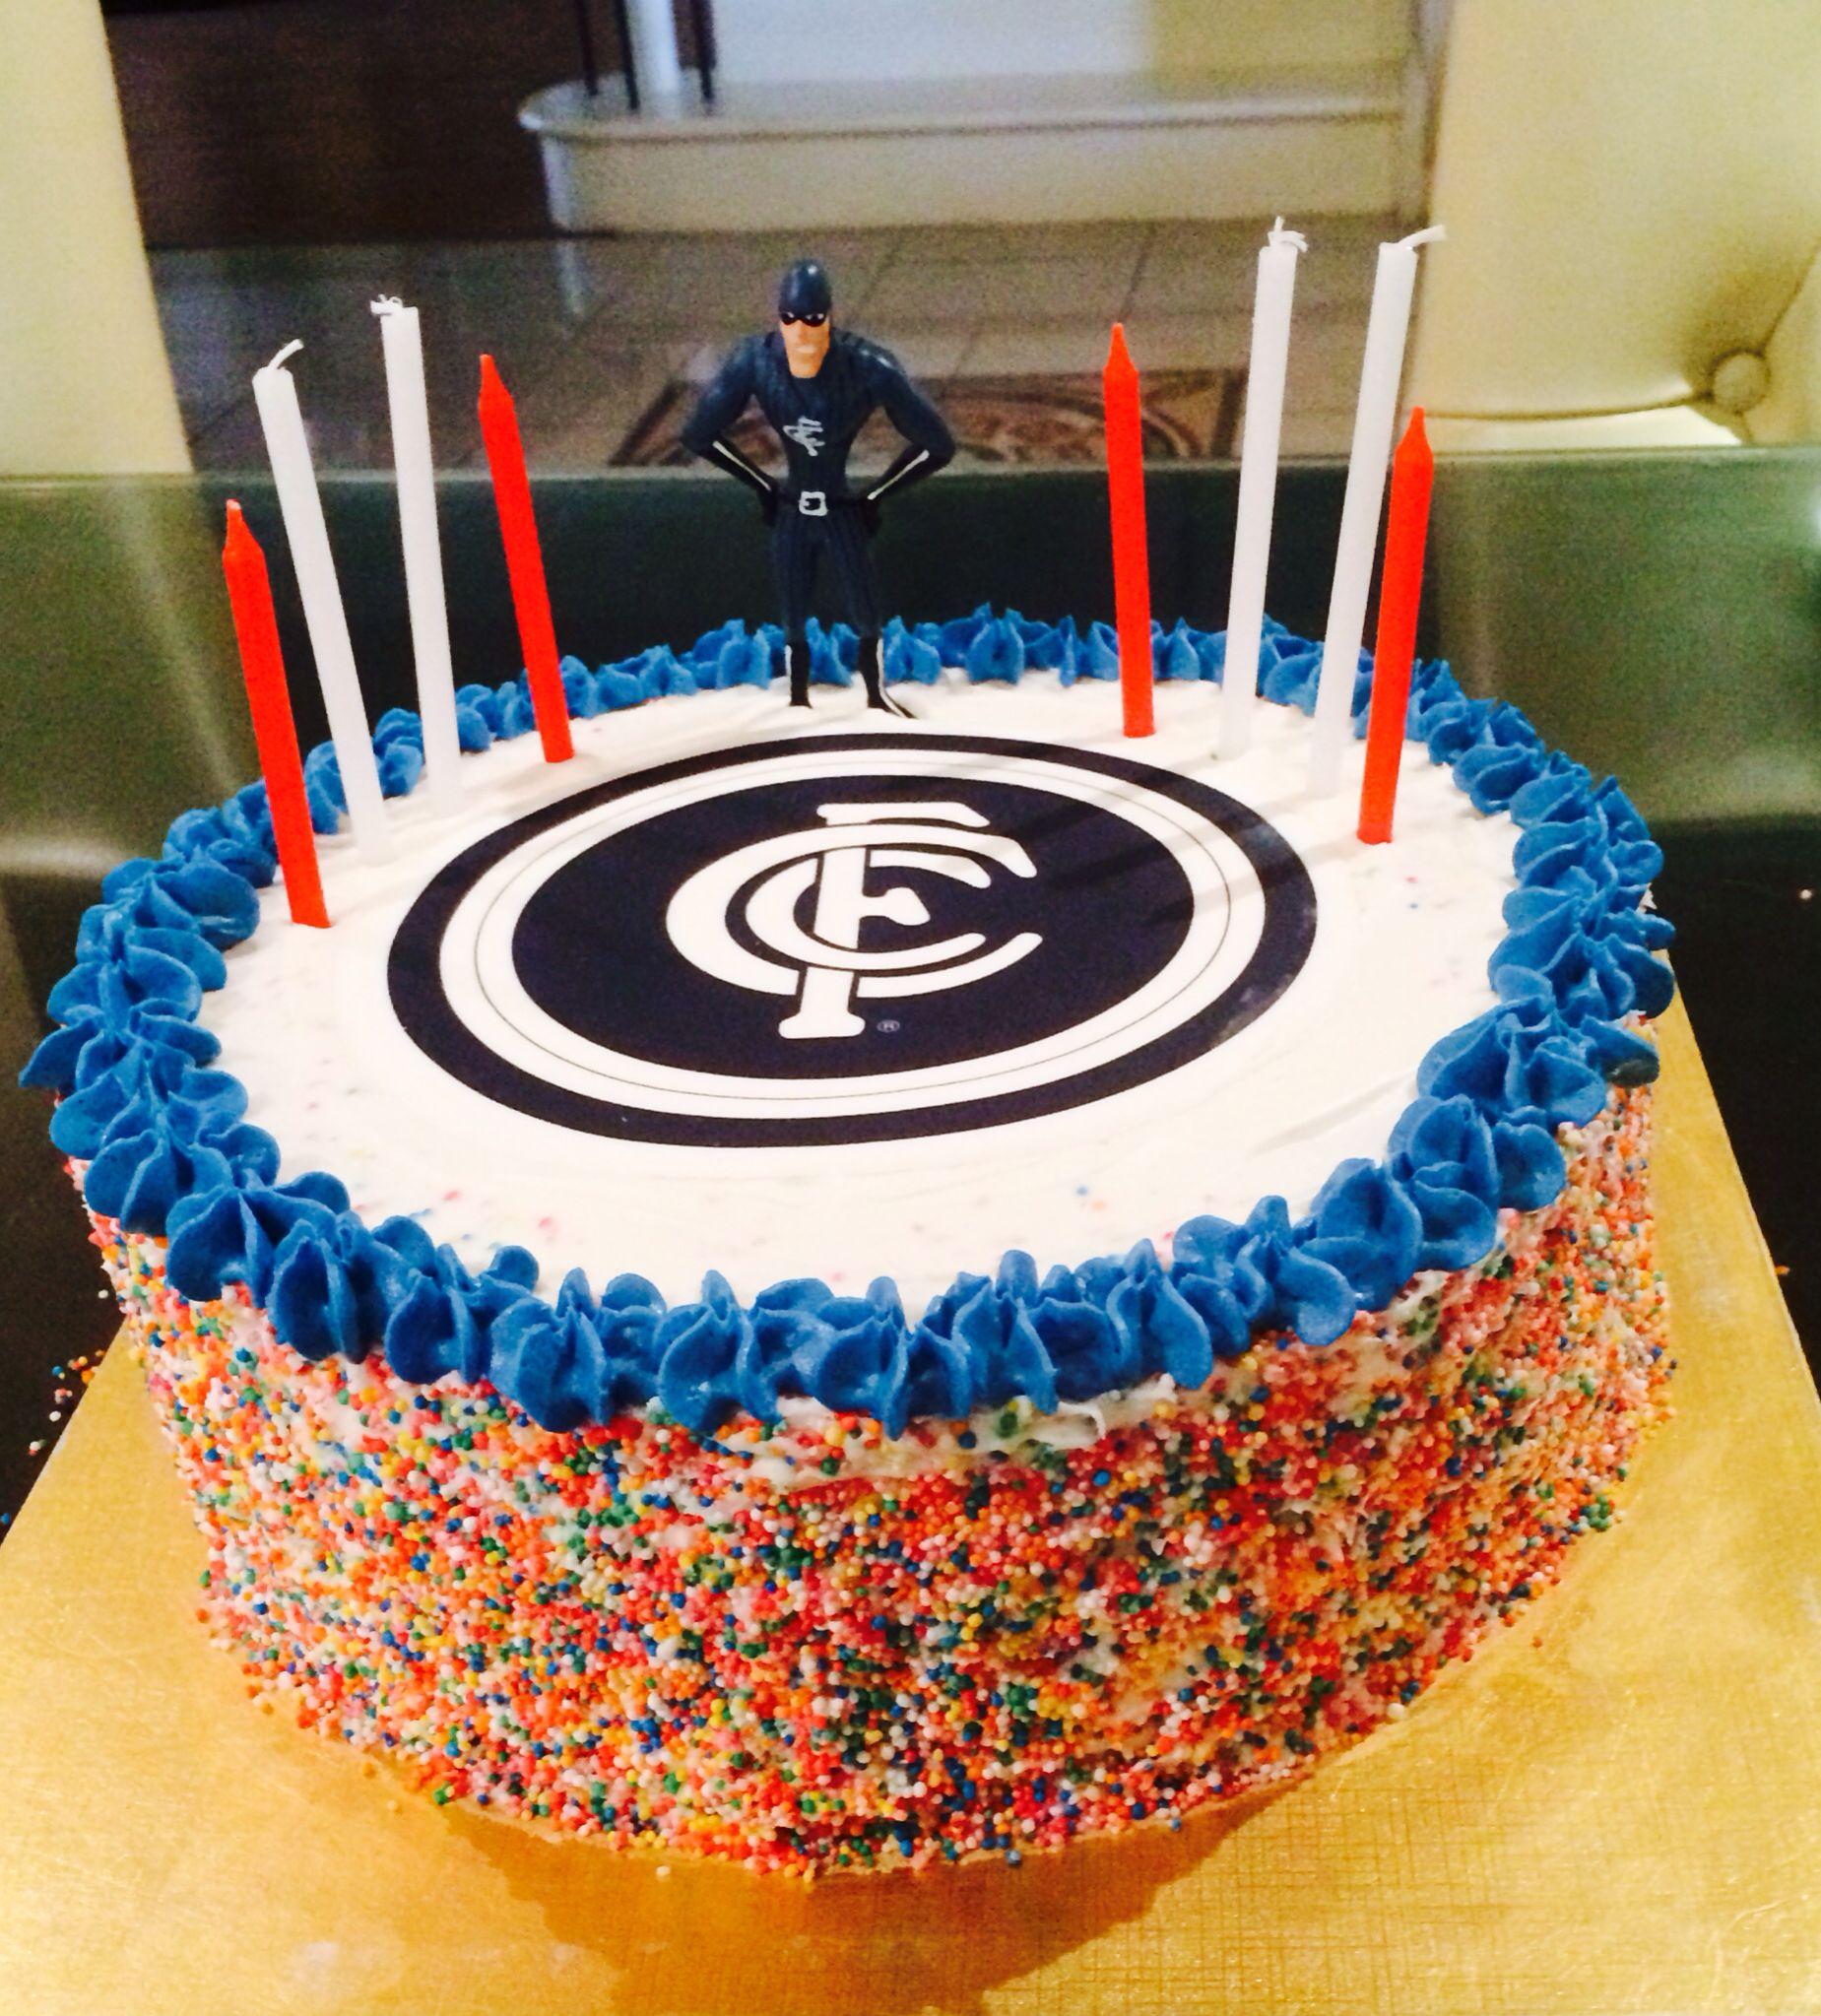 Carlton Football Club Cake I Made